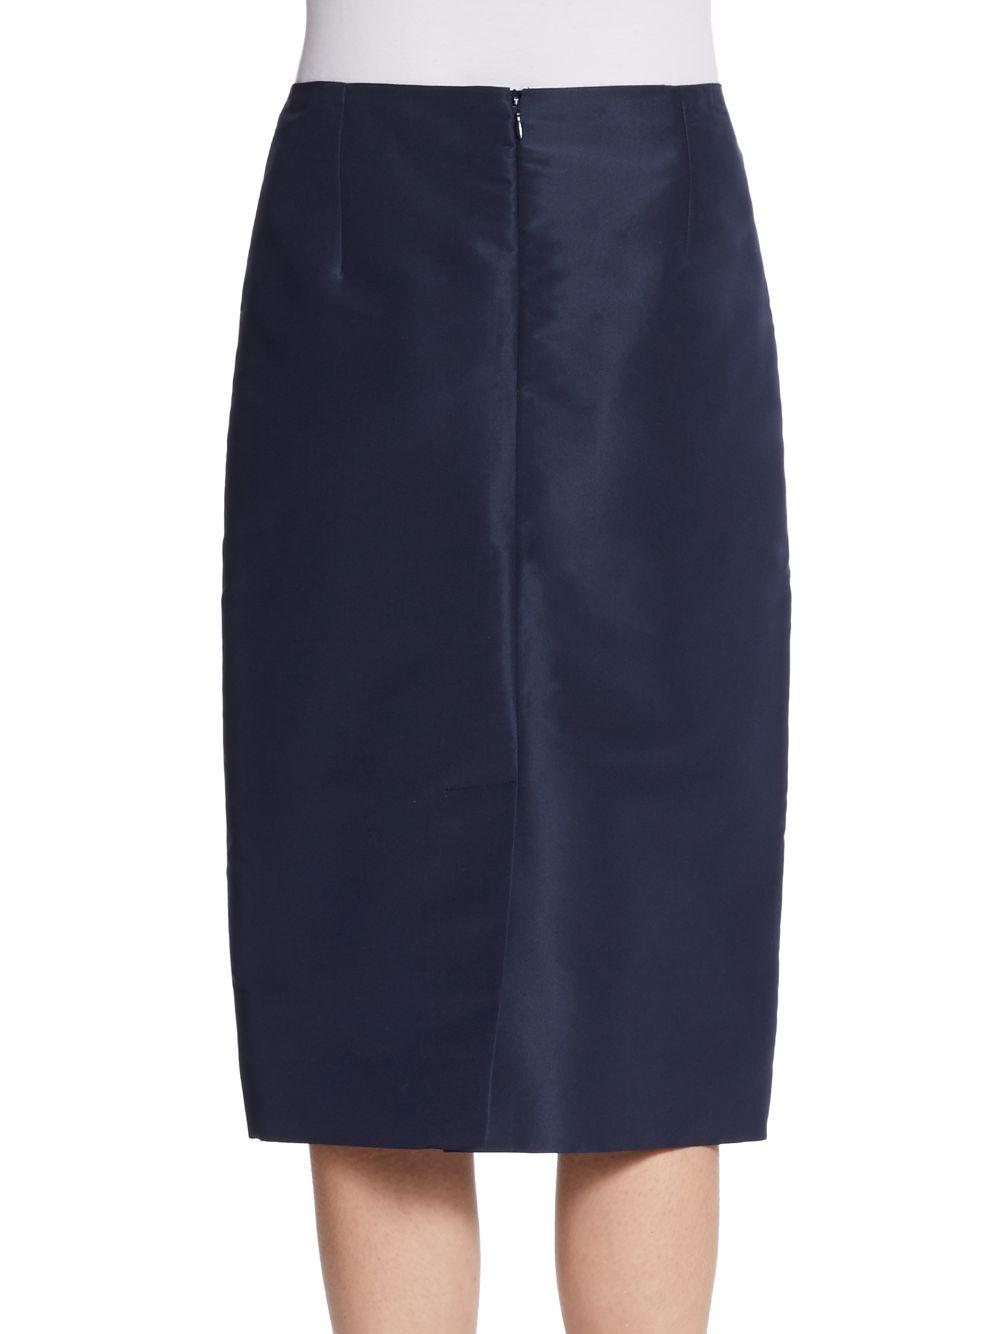 745d8222f9 Lyst - Carolina Herrera Silk Pencil Skirt in Blue